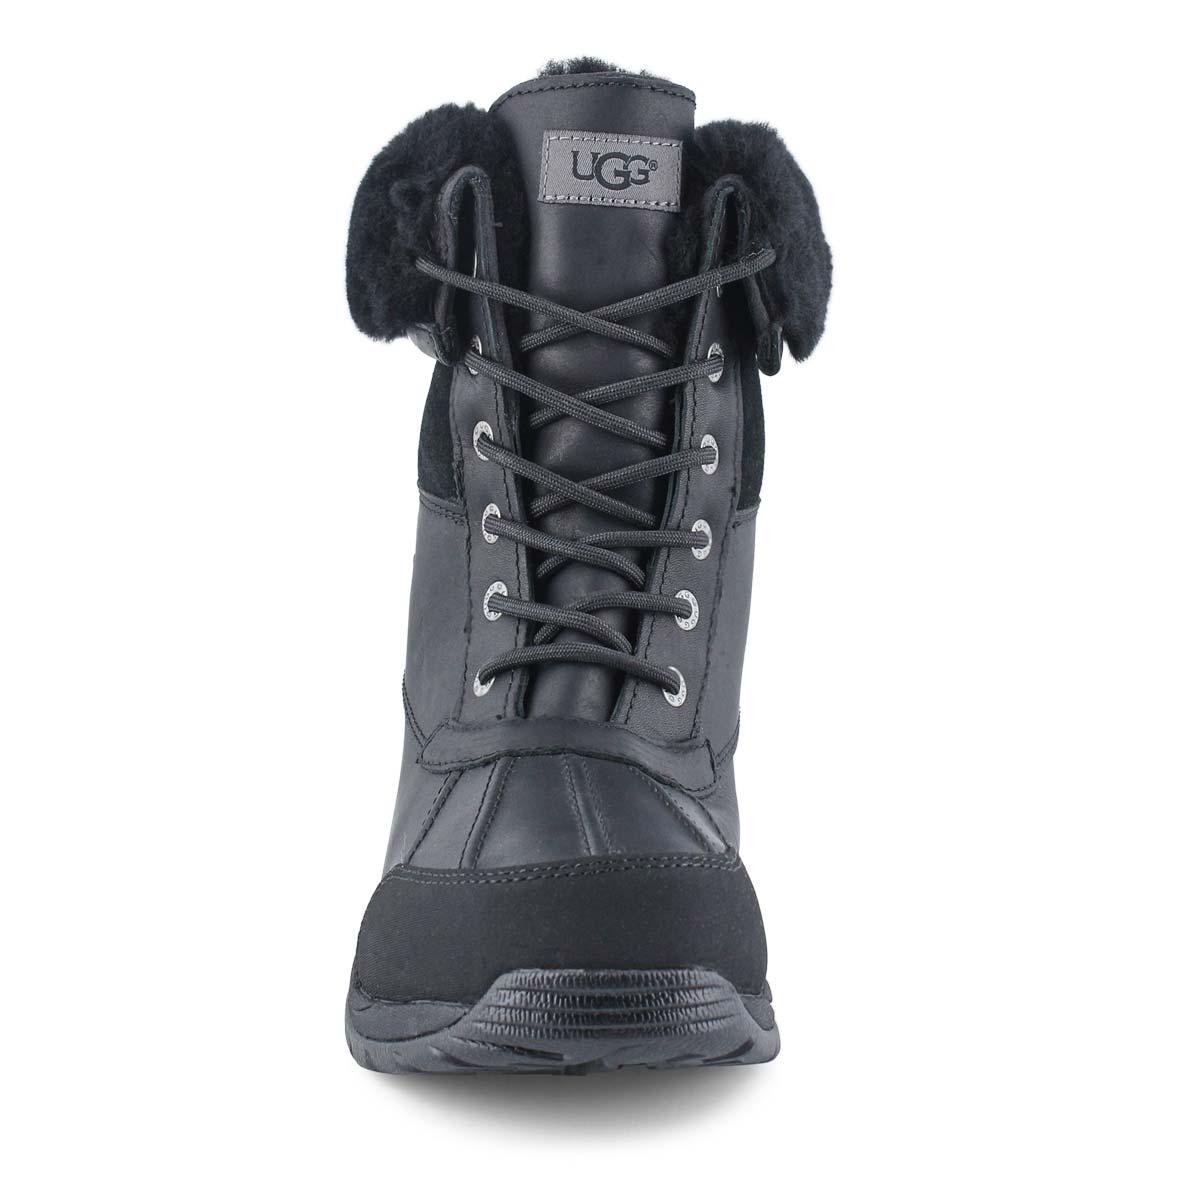 Mns Butte black sheepskin boot